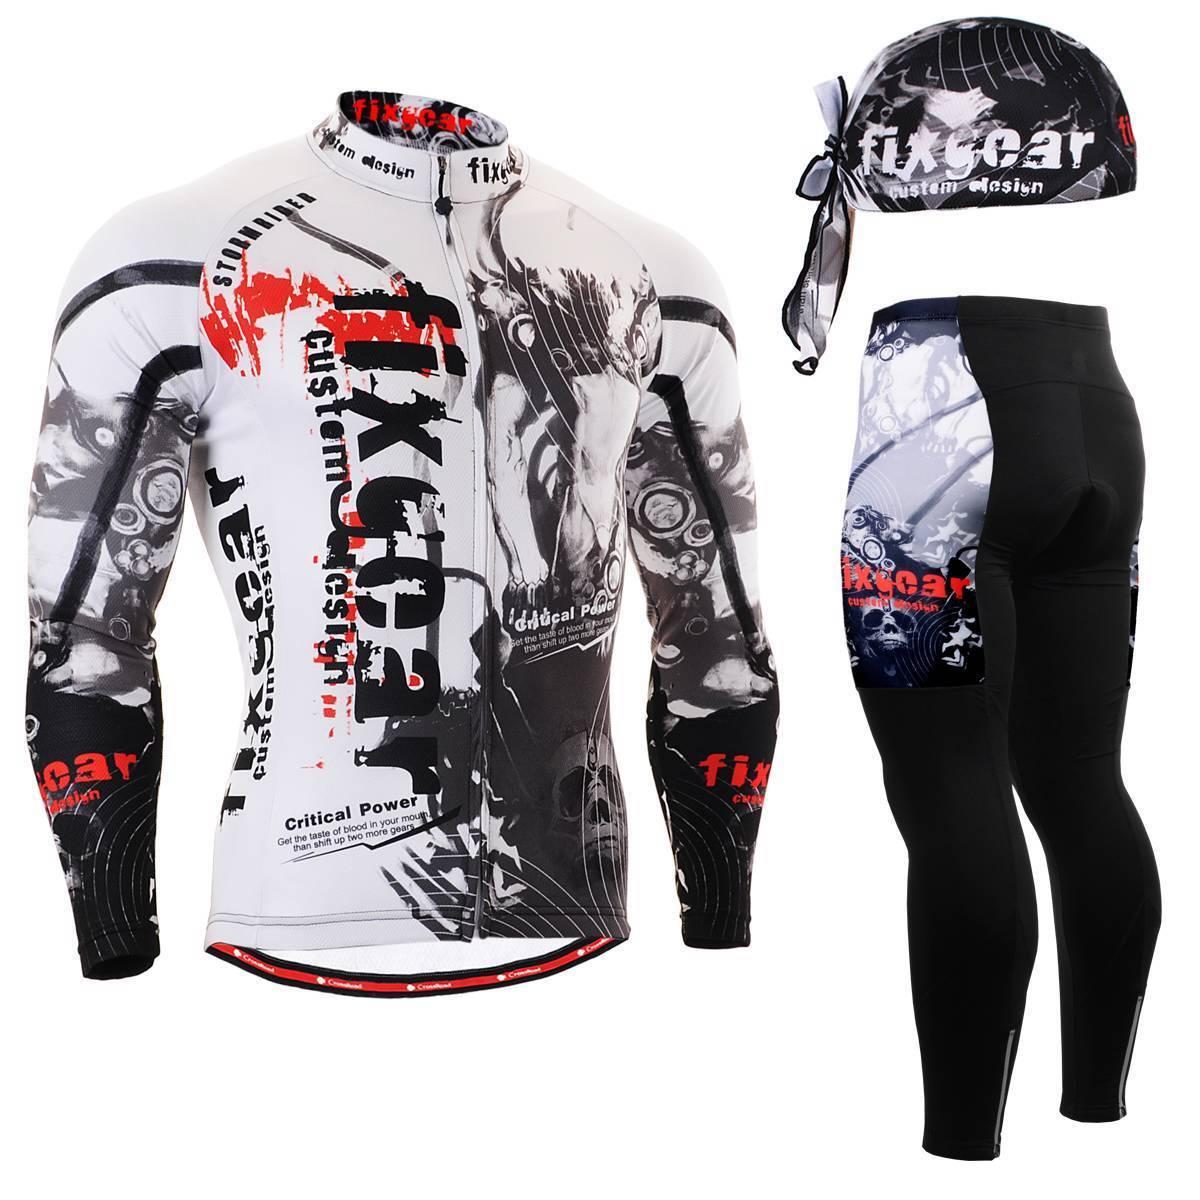 FIXGEAR CS-3001 SET Cycling Jersey Jersey Cycling & Padded Pants,MTB Bike,BMX,Beanie Free GIFT f85f28